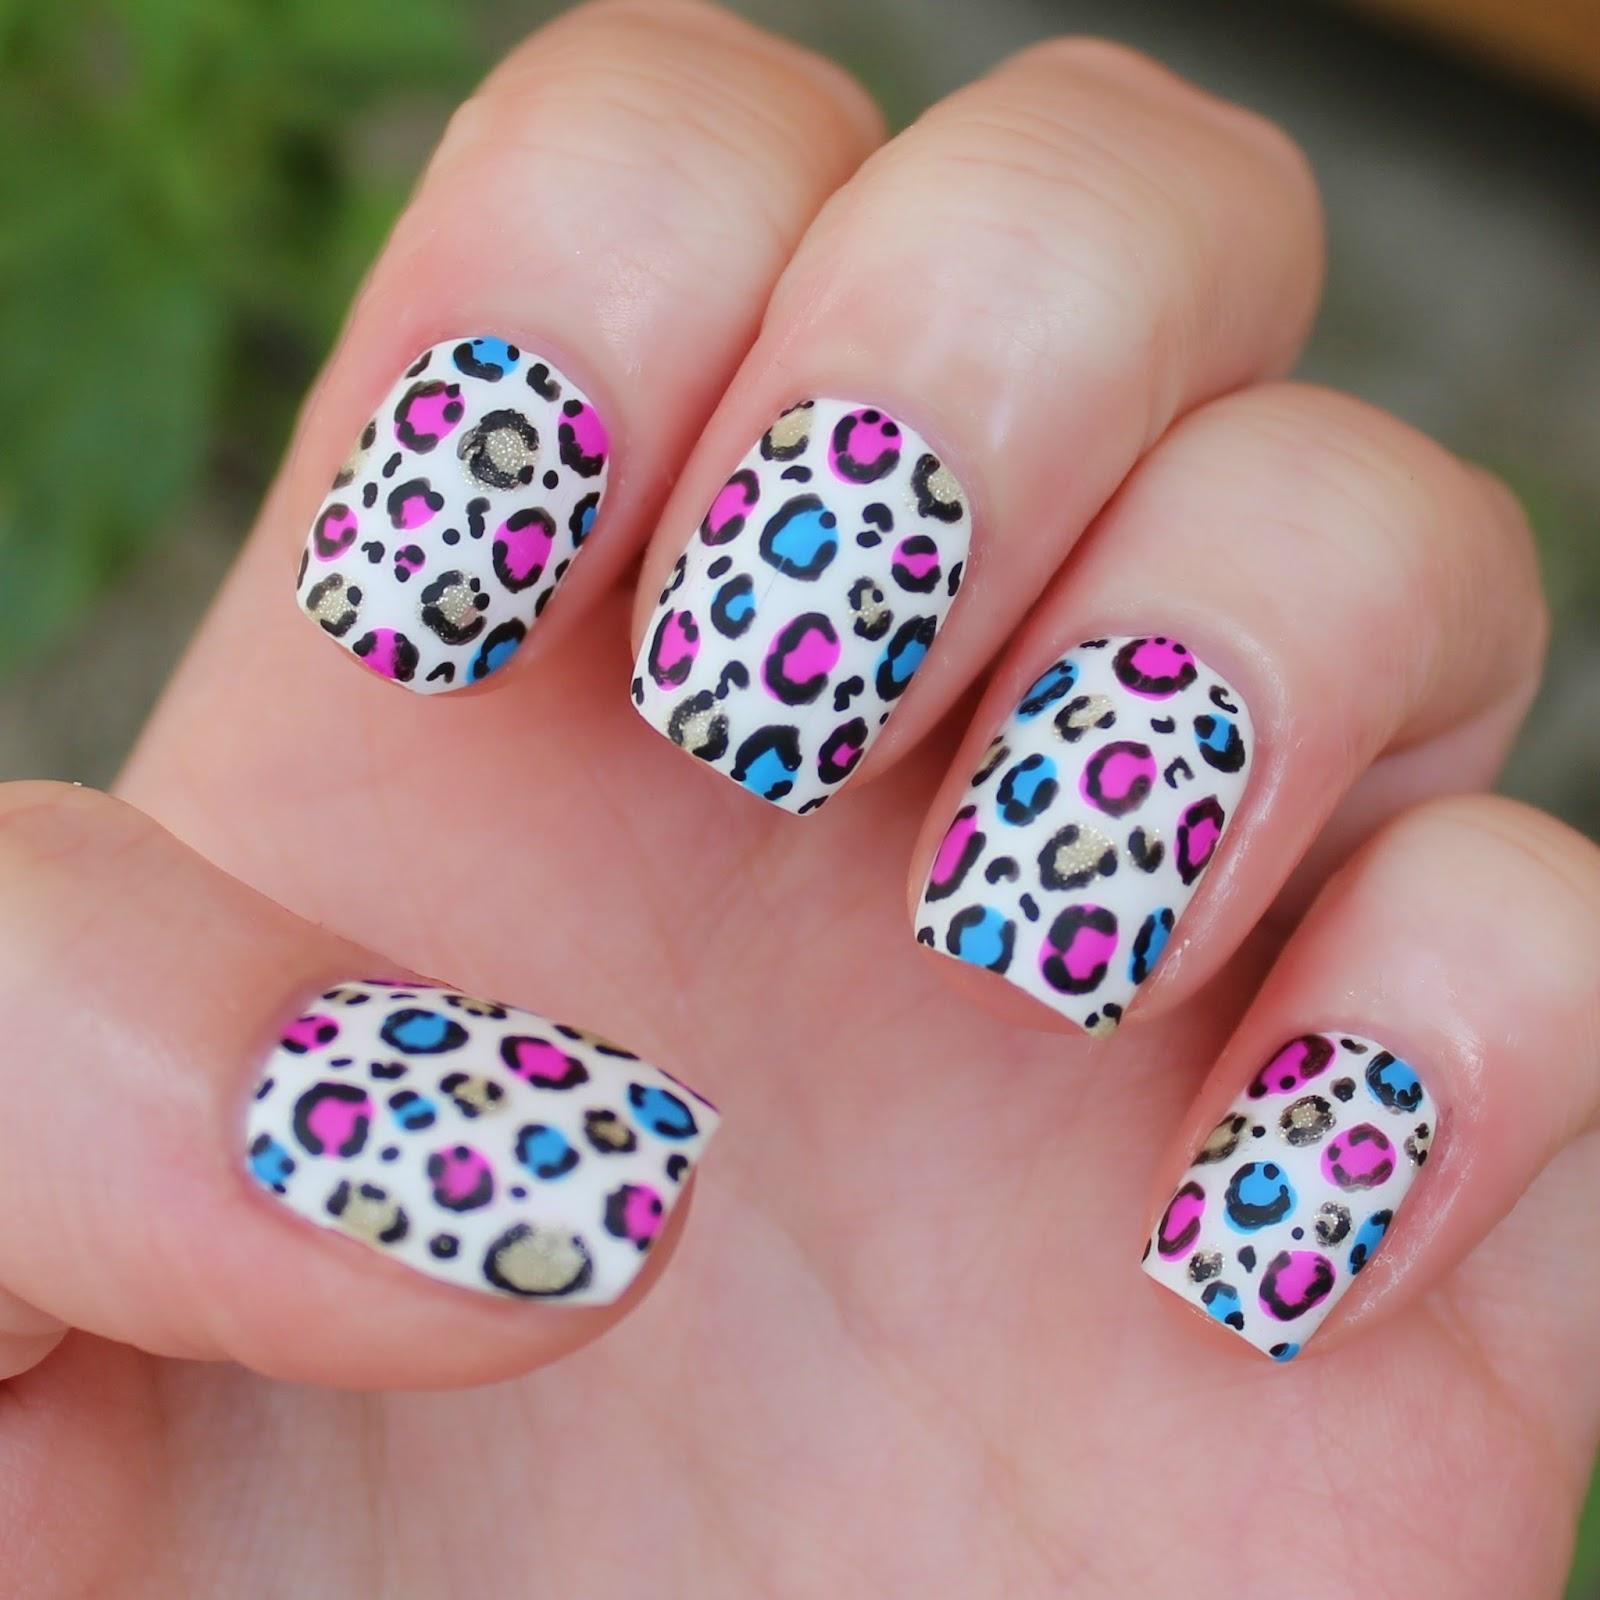 Dahlia Nails Ravenclaw Nail Art: Dahlia Nails: Festival Leopard